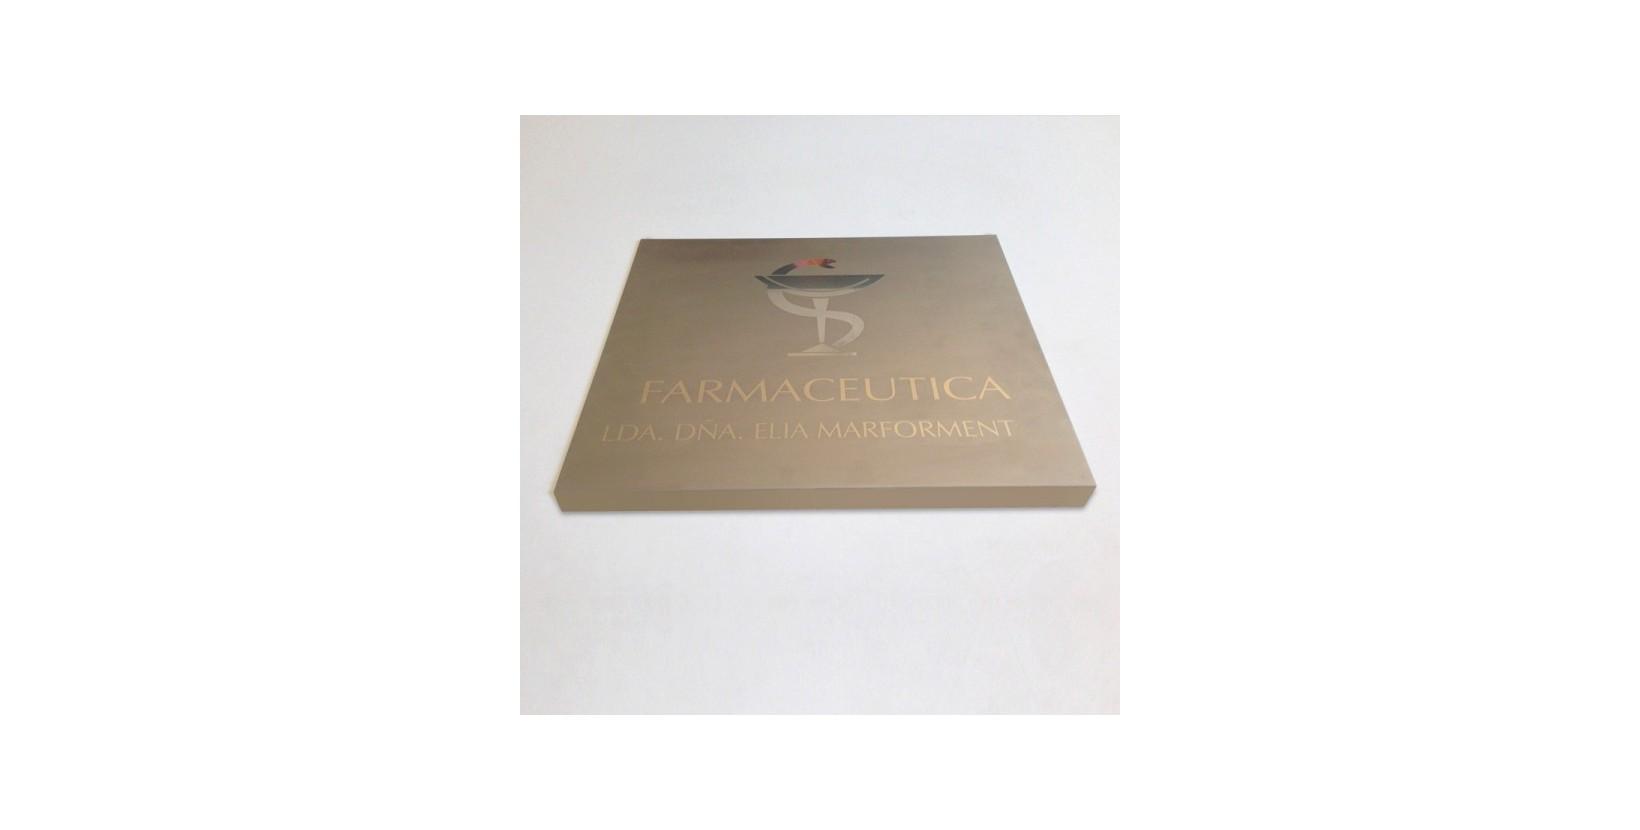 Placa de acero grabada placas grabadas de acero placa for Placa de acero